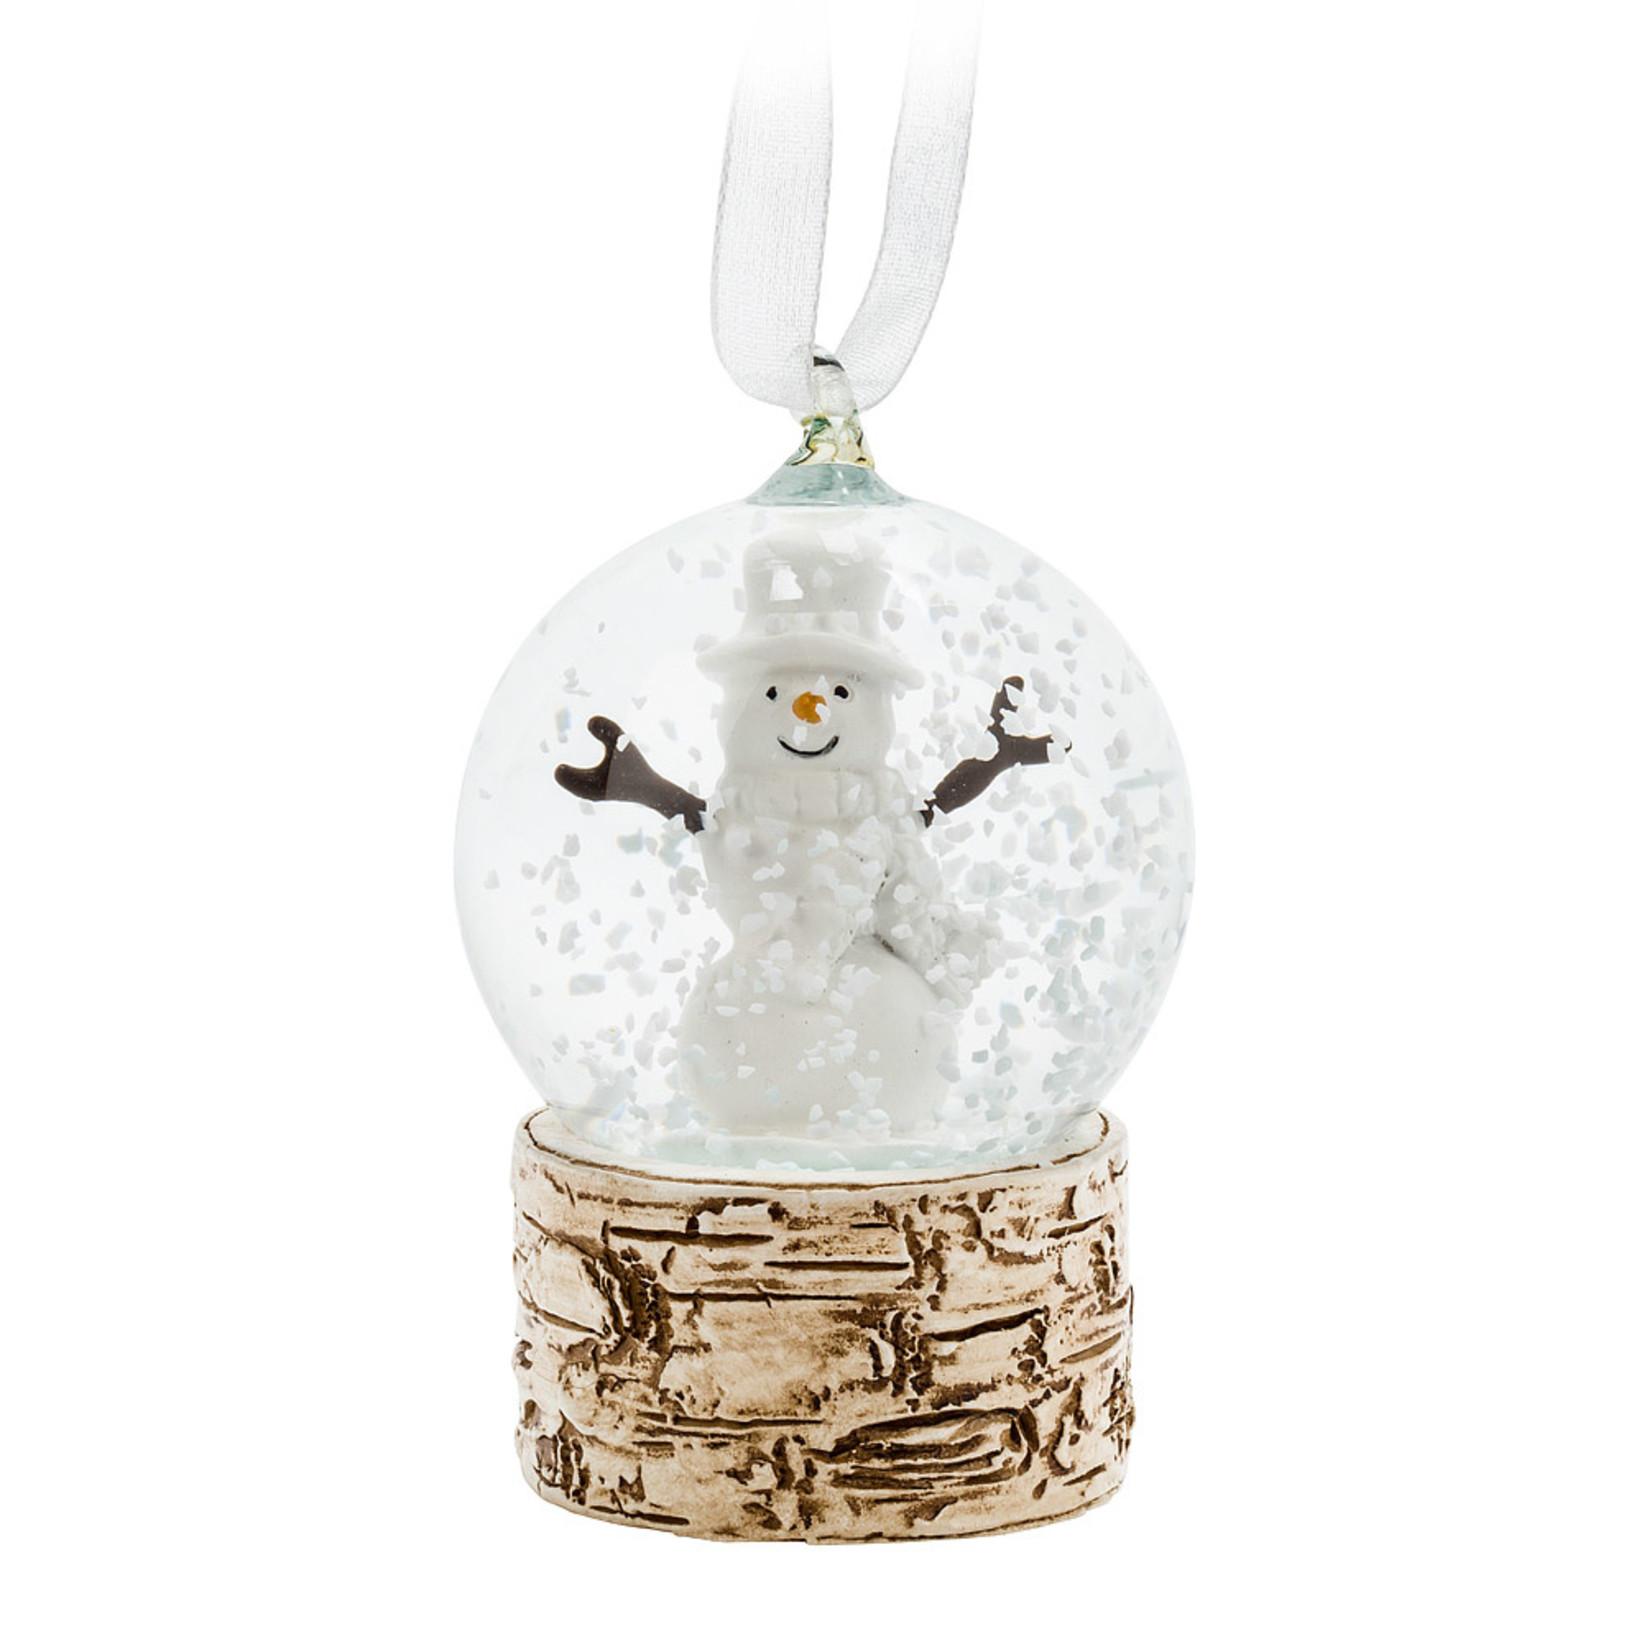 Abbott Birch Snowman Snow Globe Ornament